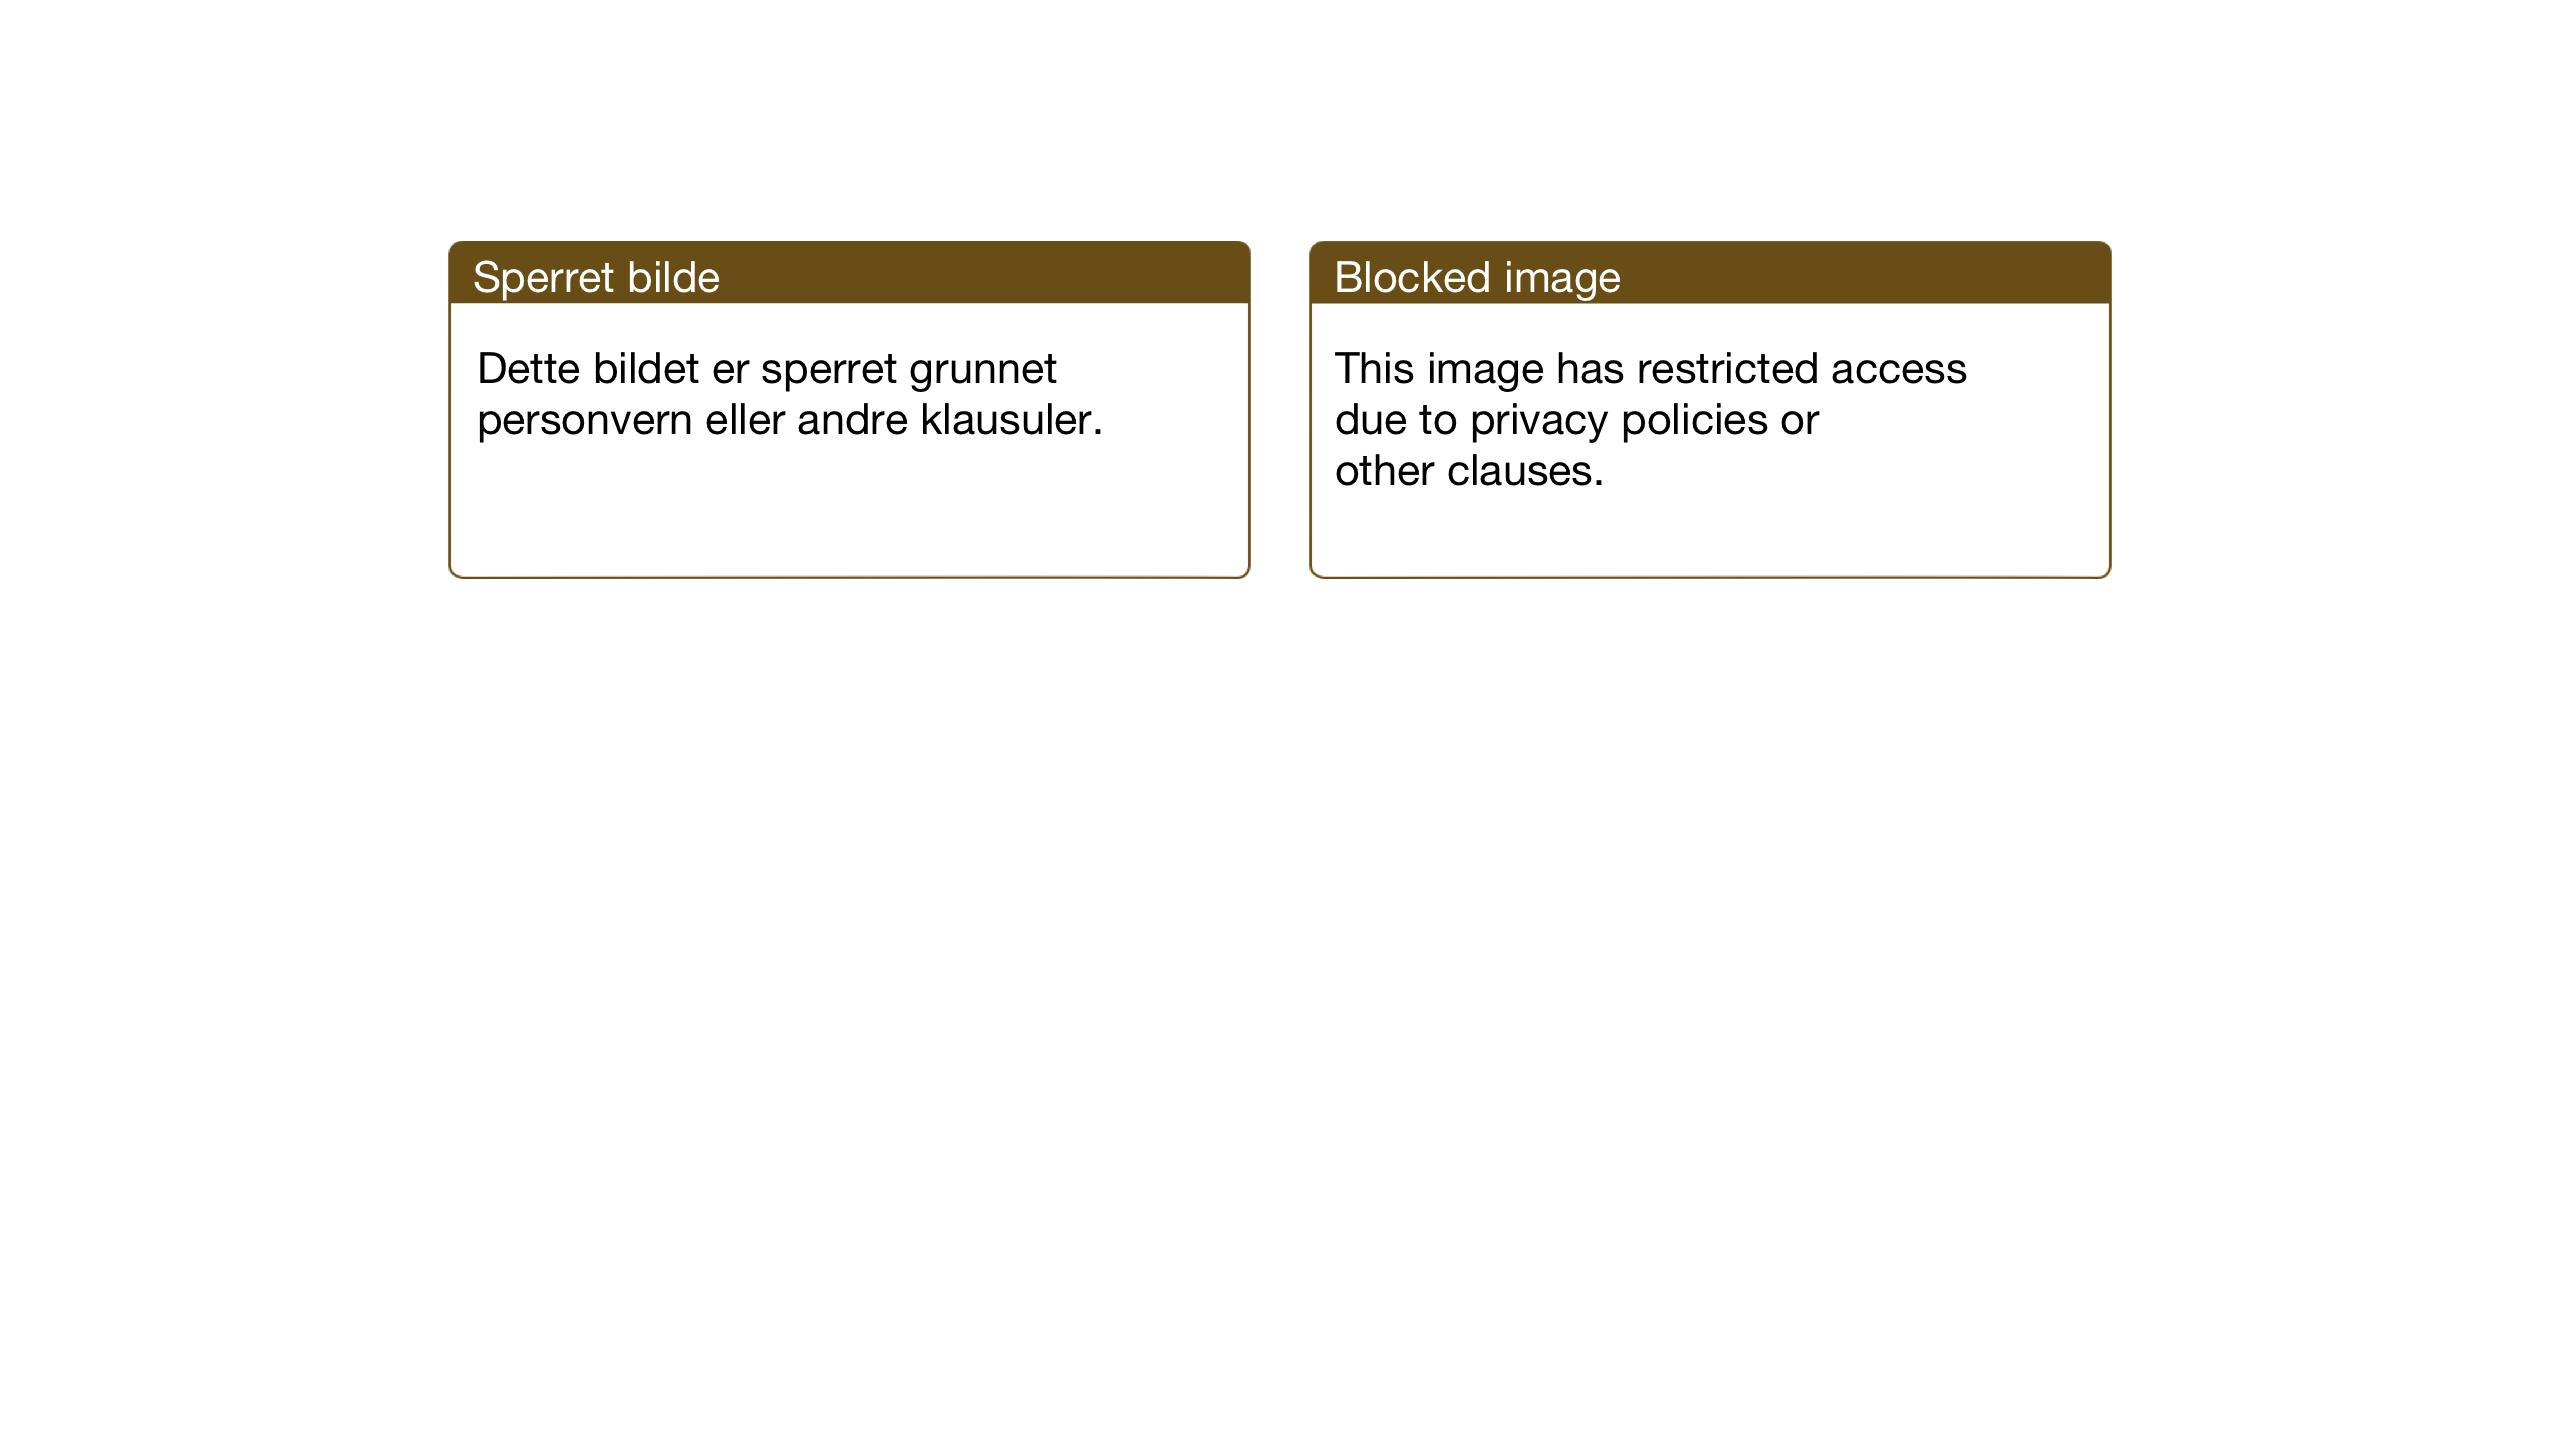 SAB, Domkirken Sokneprestembete, H/Haa: Ministerialbok nr. C 9, 1958-2001, s. 215b-216a